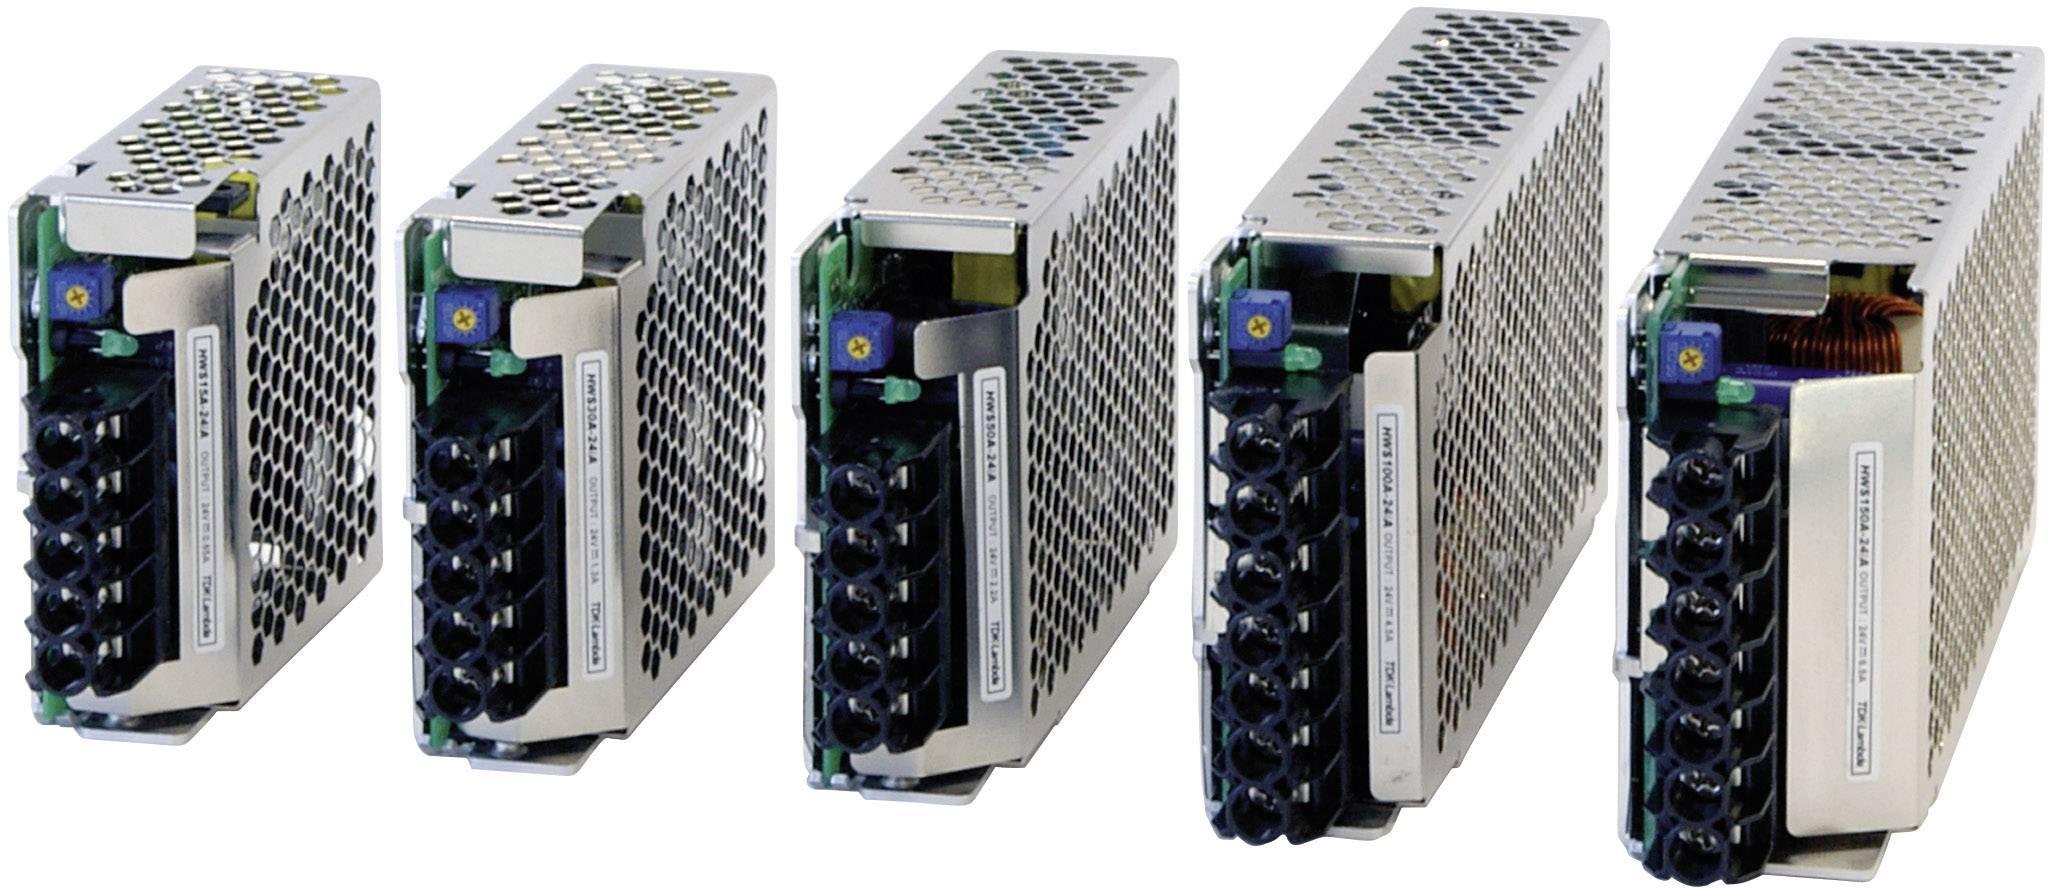 Zabudovateľný napájací zdroj TDK-Lambda HWS-30A-5, 5 V, 30 W